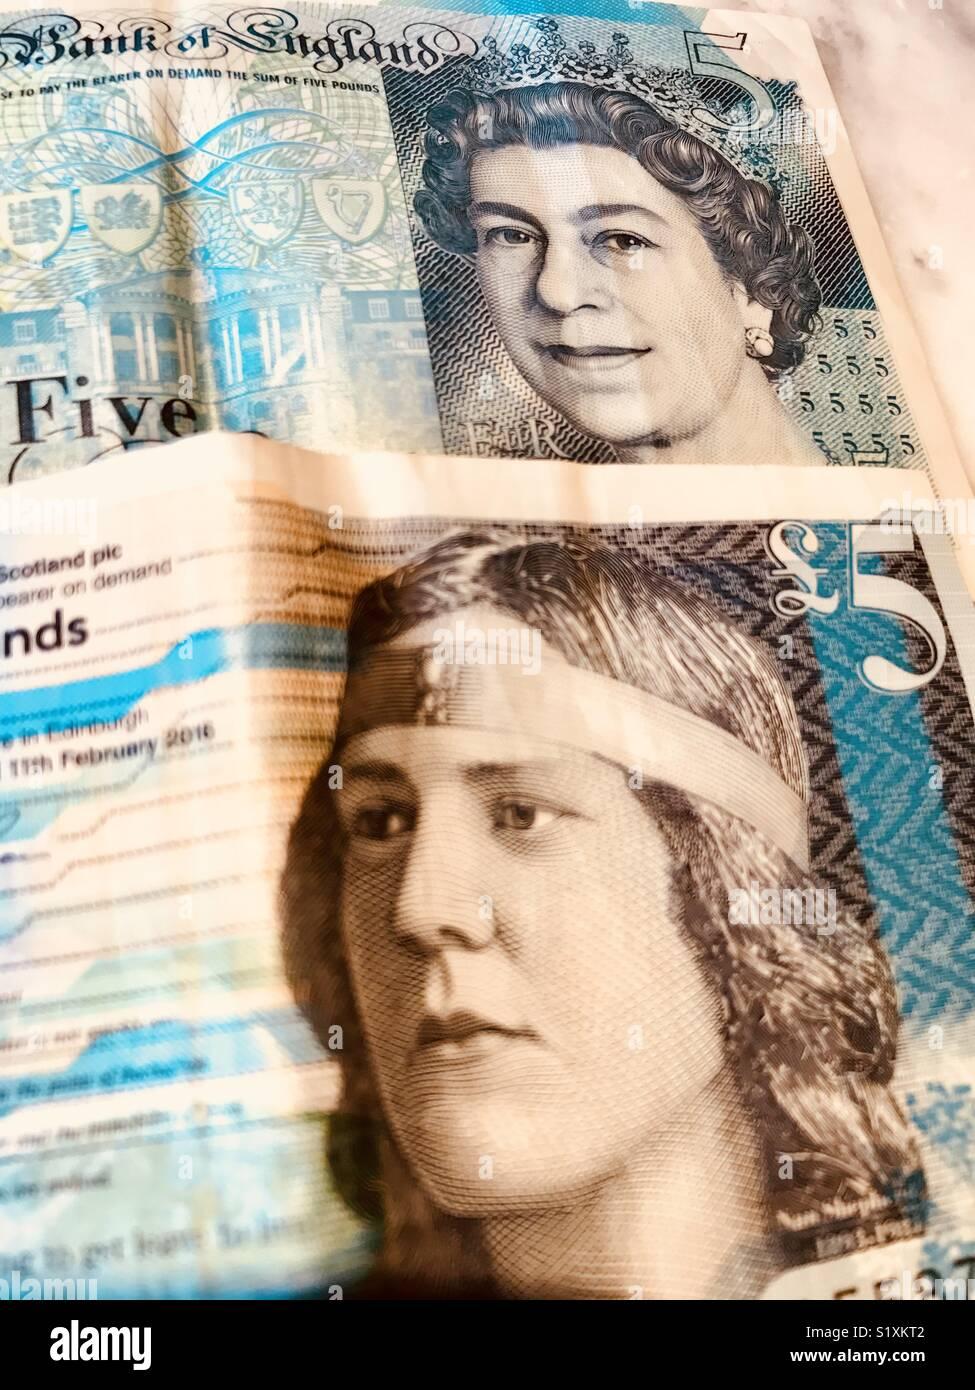 British and Scottish five pound notes - Stock Image